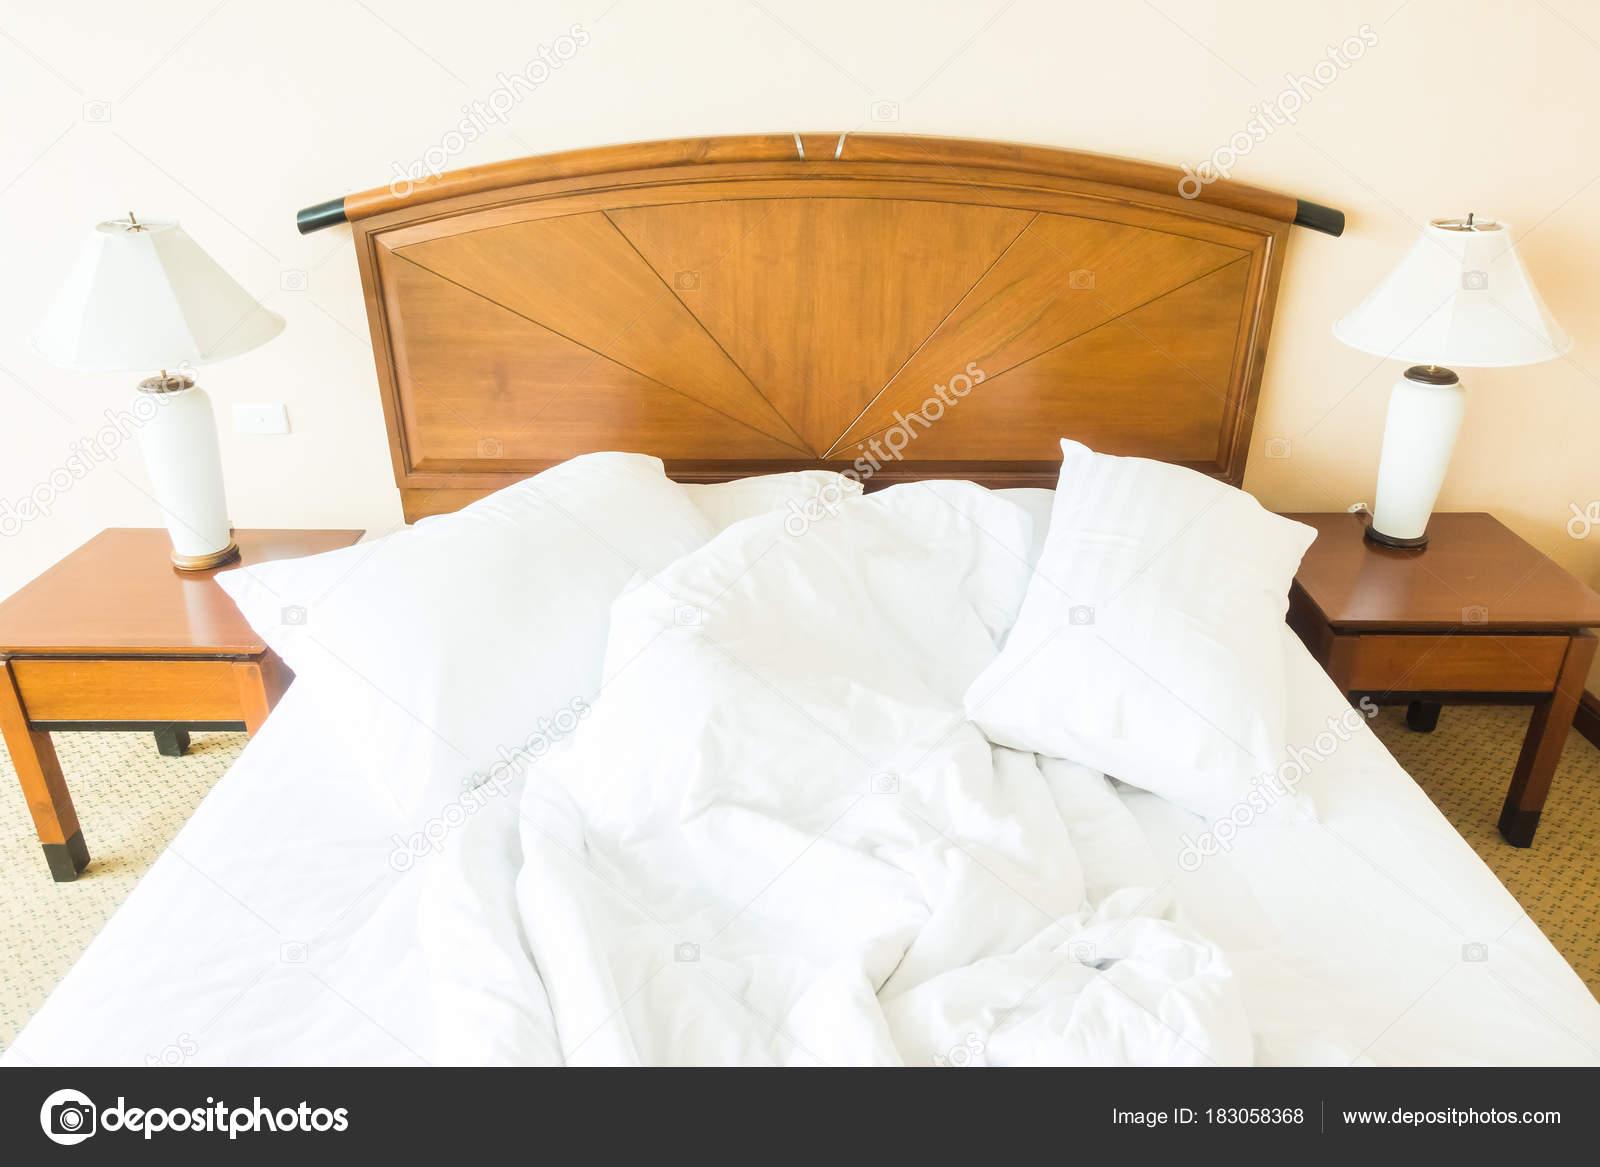 kissen bett free kopfkissen with kissen bett elegant baumwolle kissen dreieck taille brostuhl. Black Bedroom Furniture Sets. Home Design Ideas